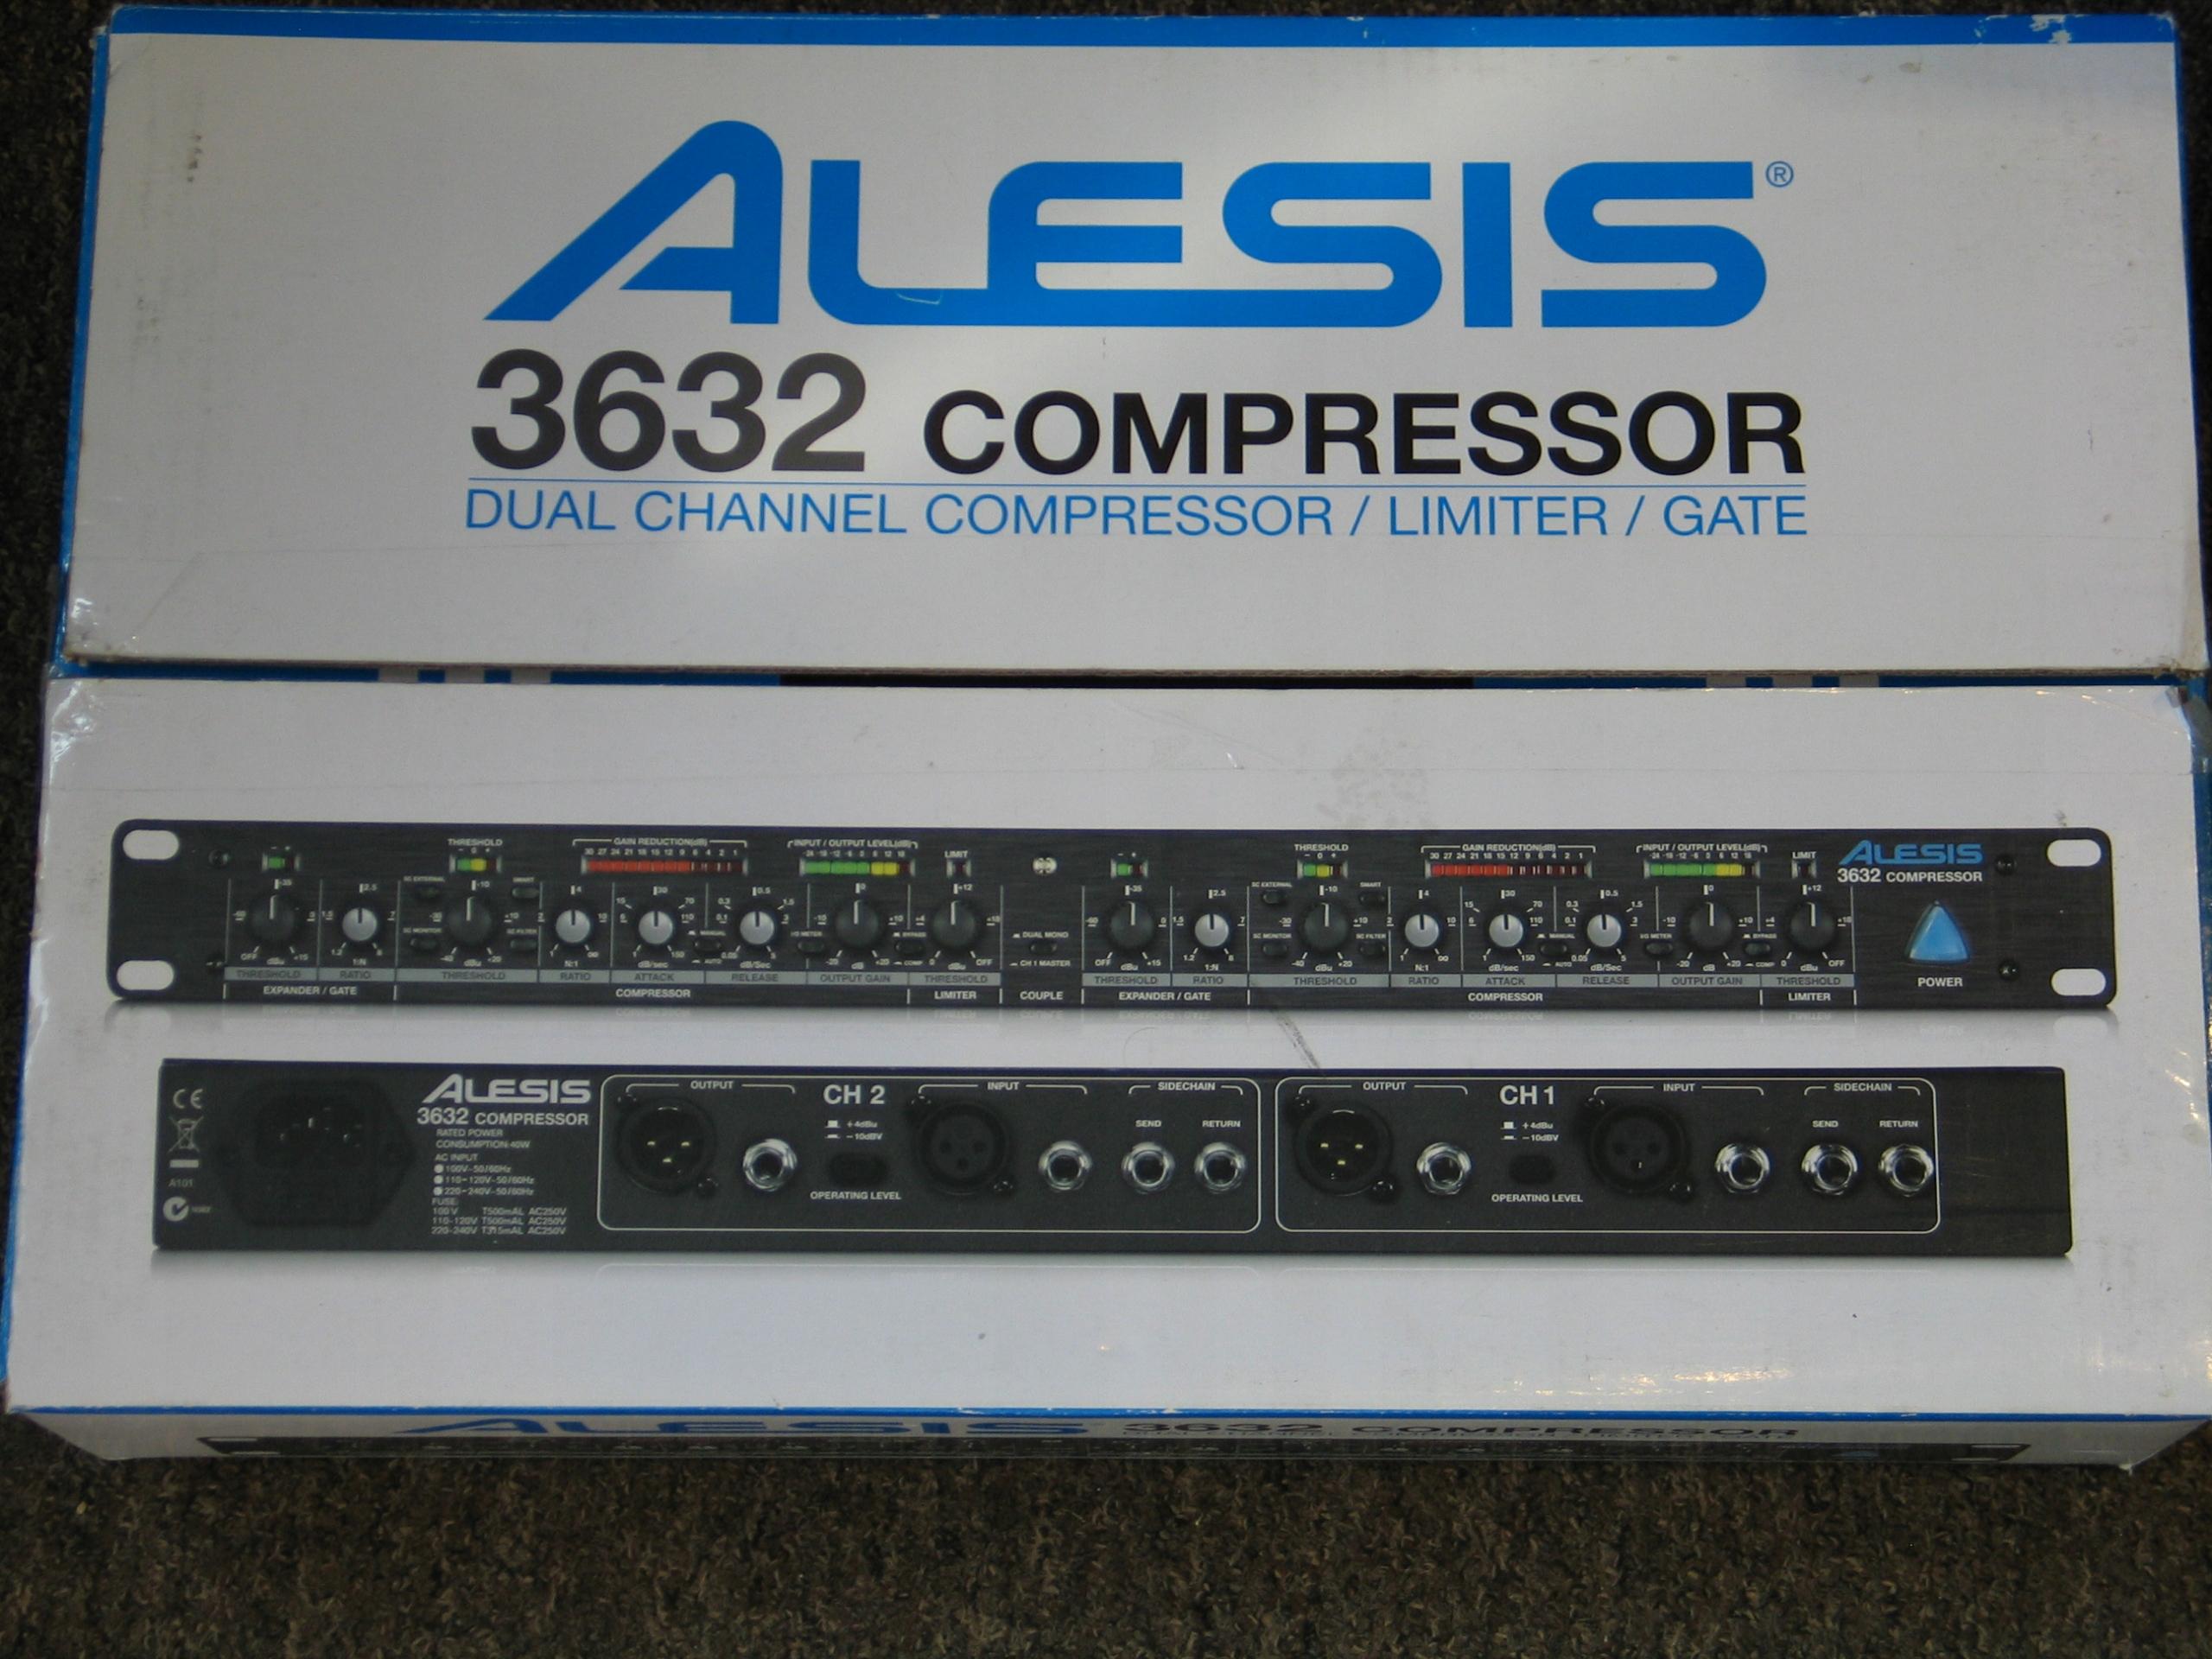 ALESIS 3632 Compressor kompresor, JAK NOWY, GDAŃSK